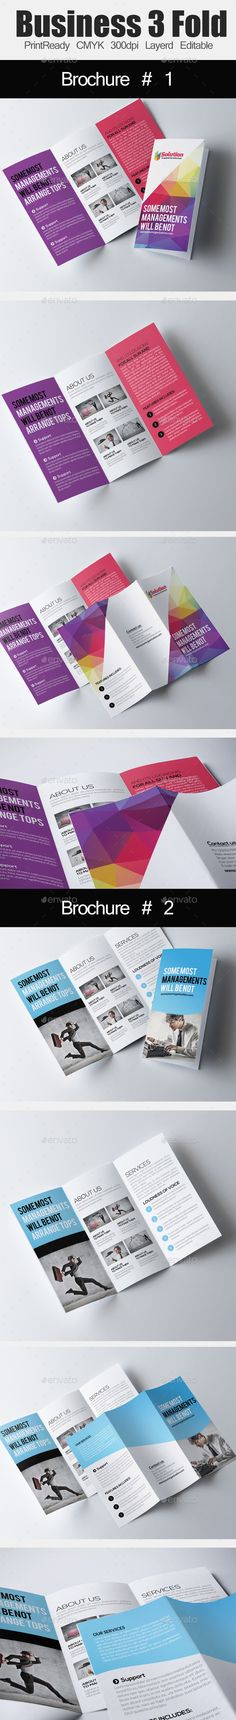 Tri Fold Business Brochure Bundle Template #design Download: http://graphicriver.net/item/tri-fold-business-brochure-bundle/12960542?ref=ksioks